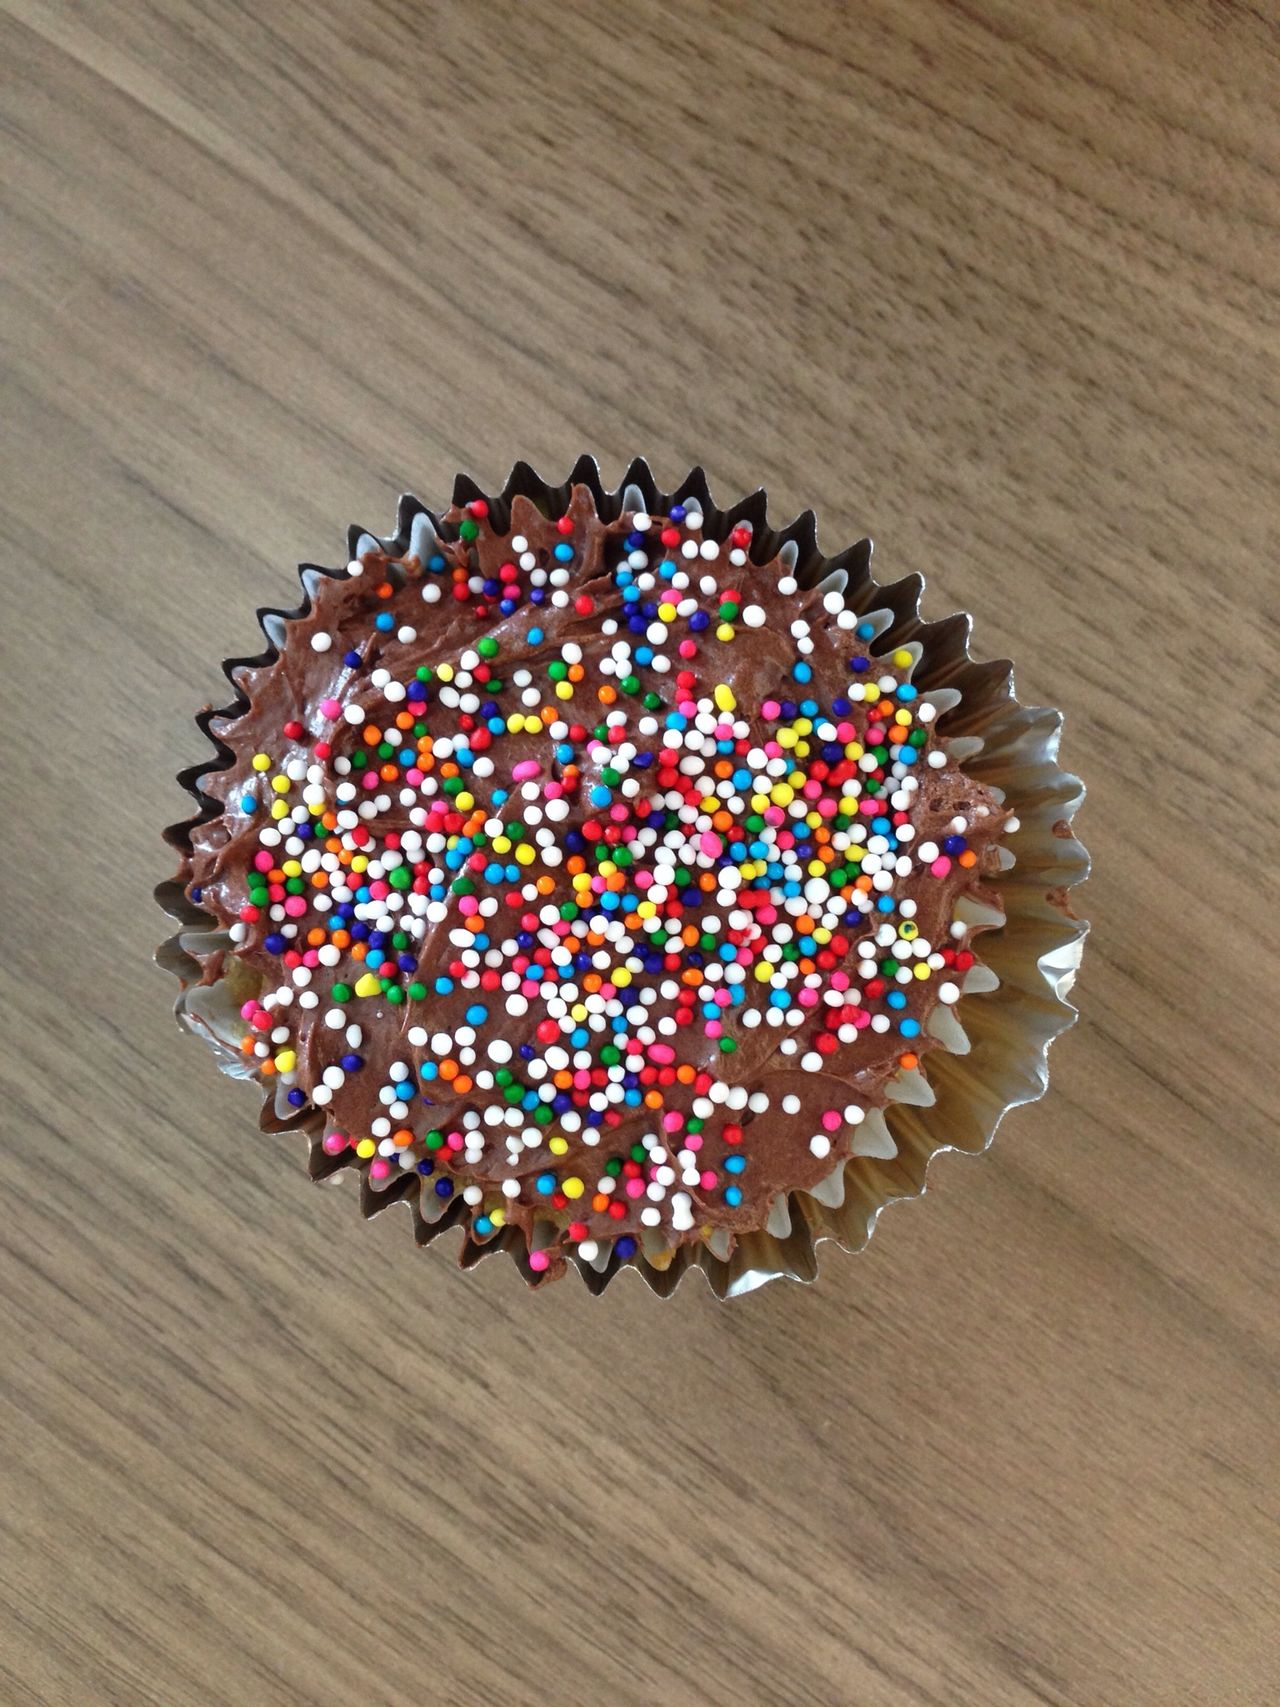 Beautiful stock photos of candy, Close-Up, Cupcake, Day, Domestic Life